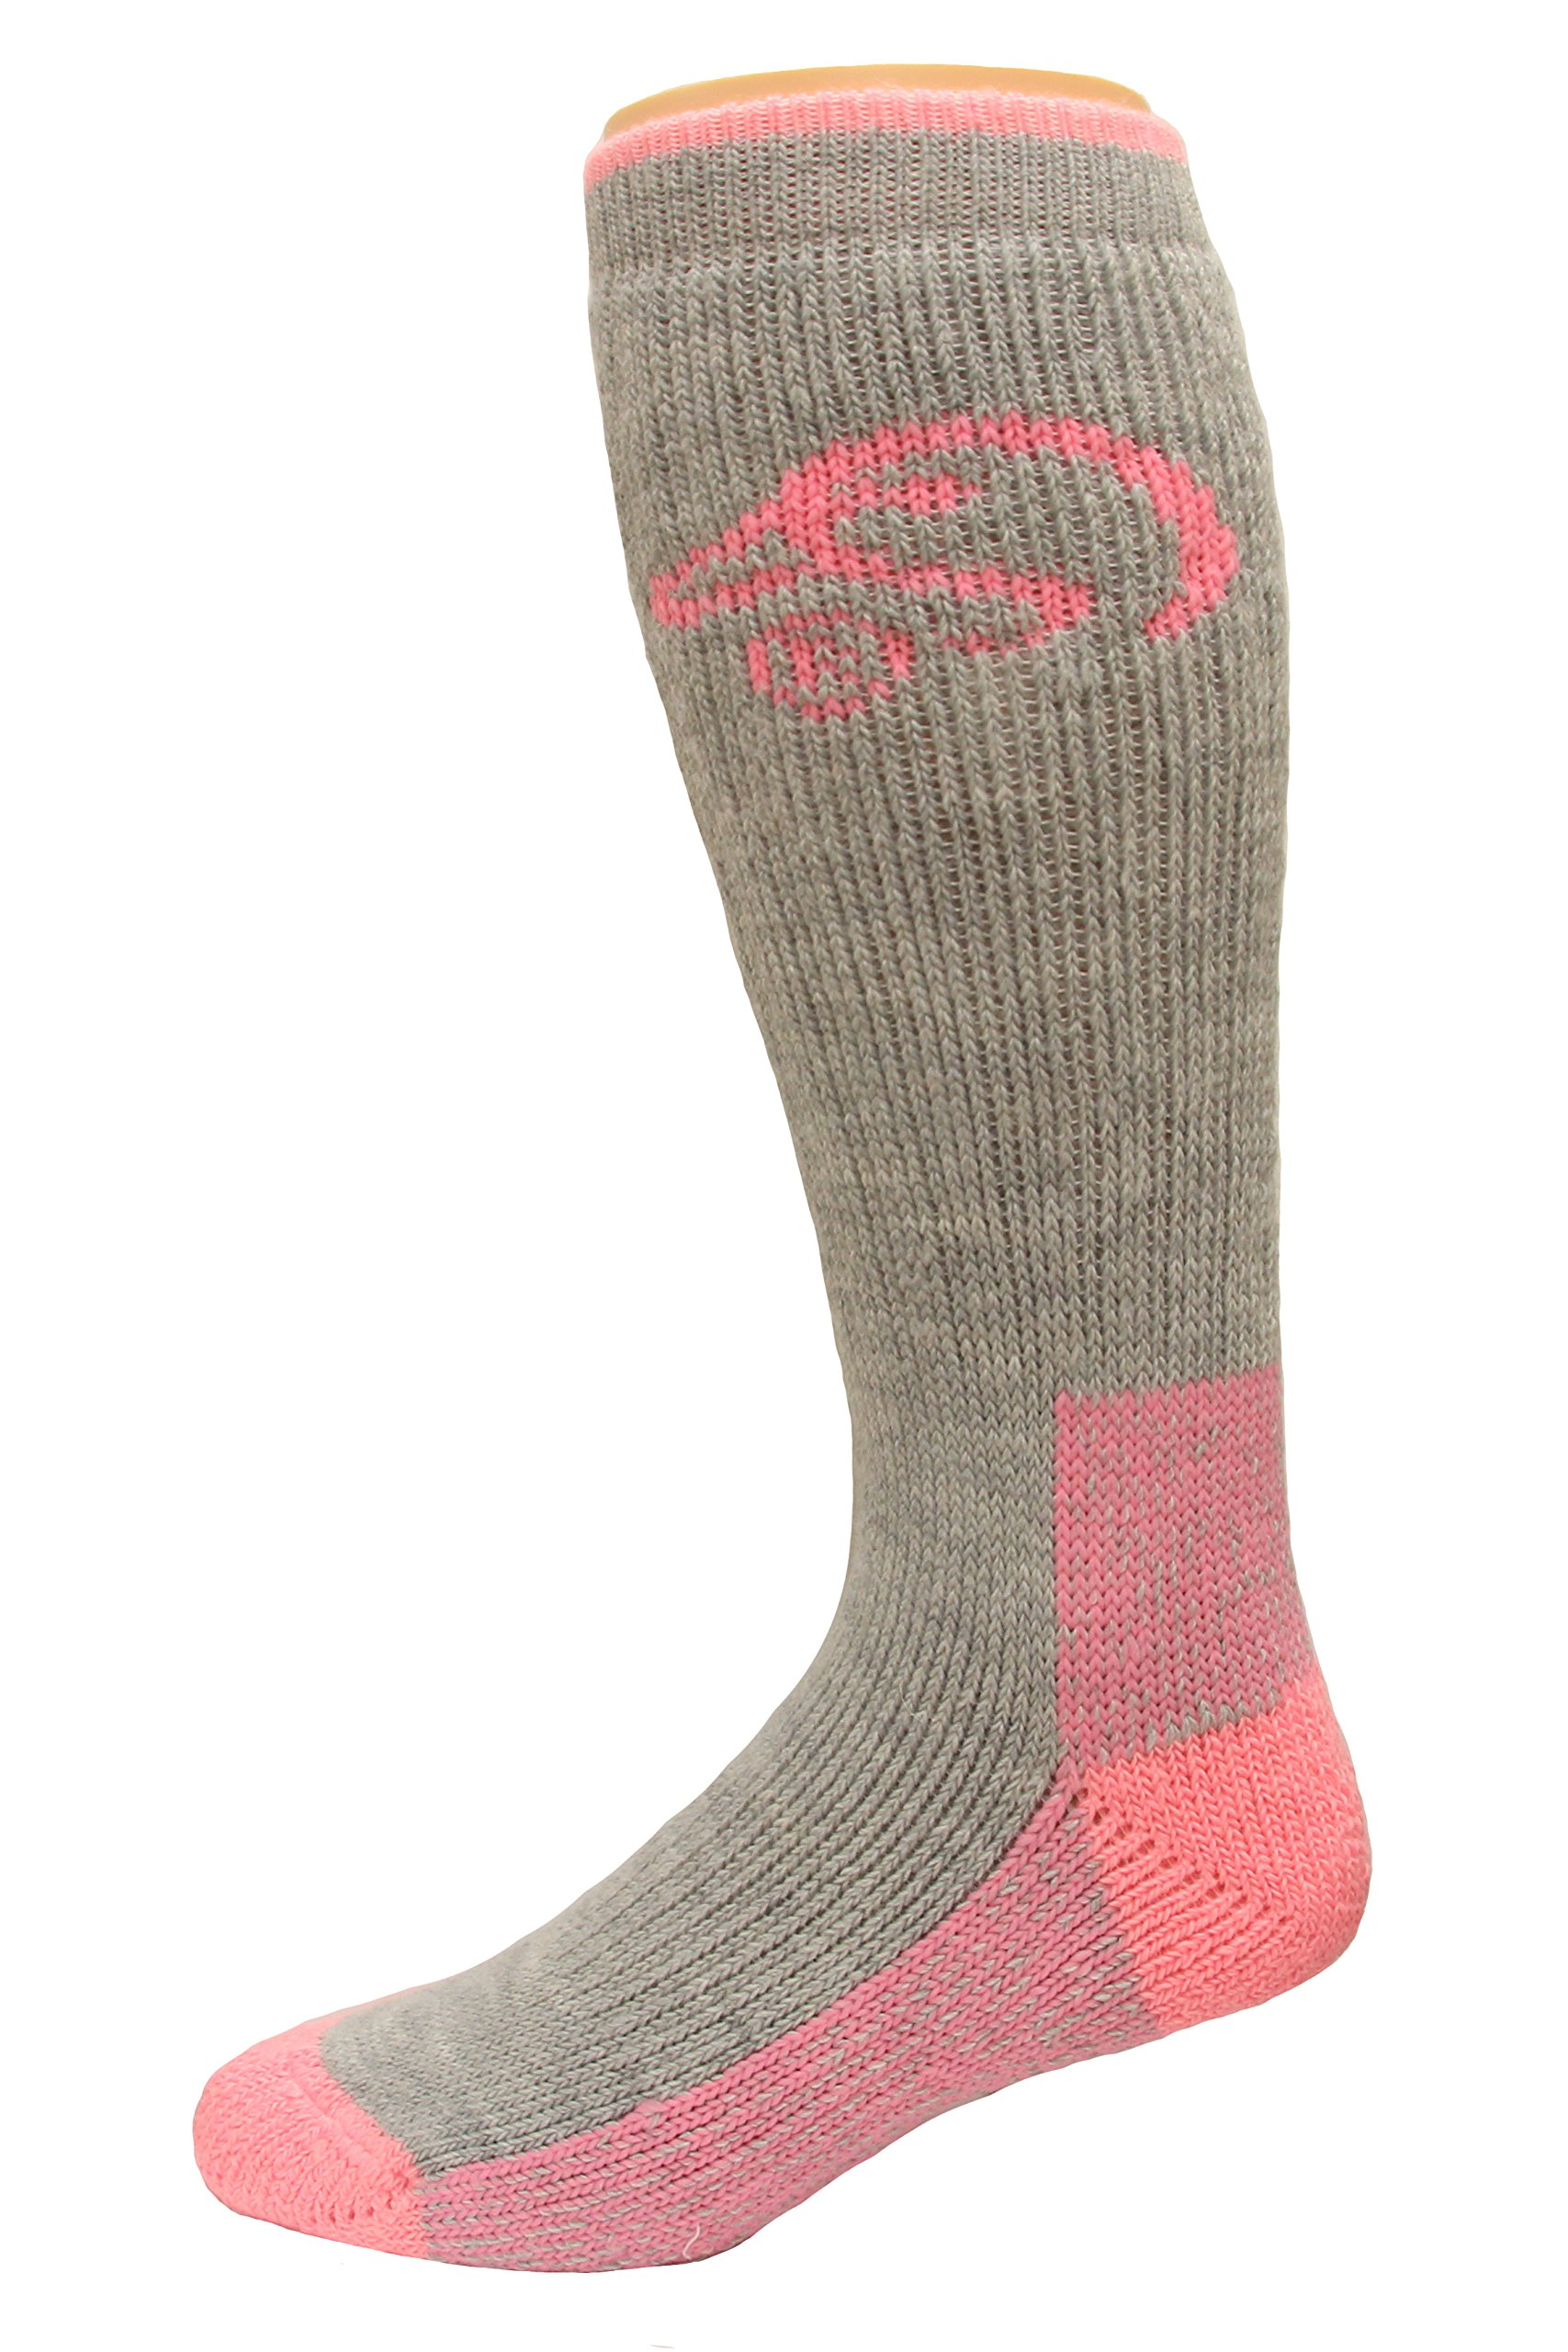 Ducks Unlimited Women's Comfy House Socks, Gray, Medium by Ducks Unlimited